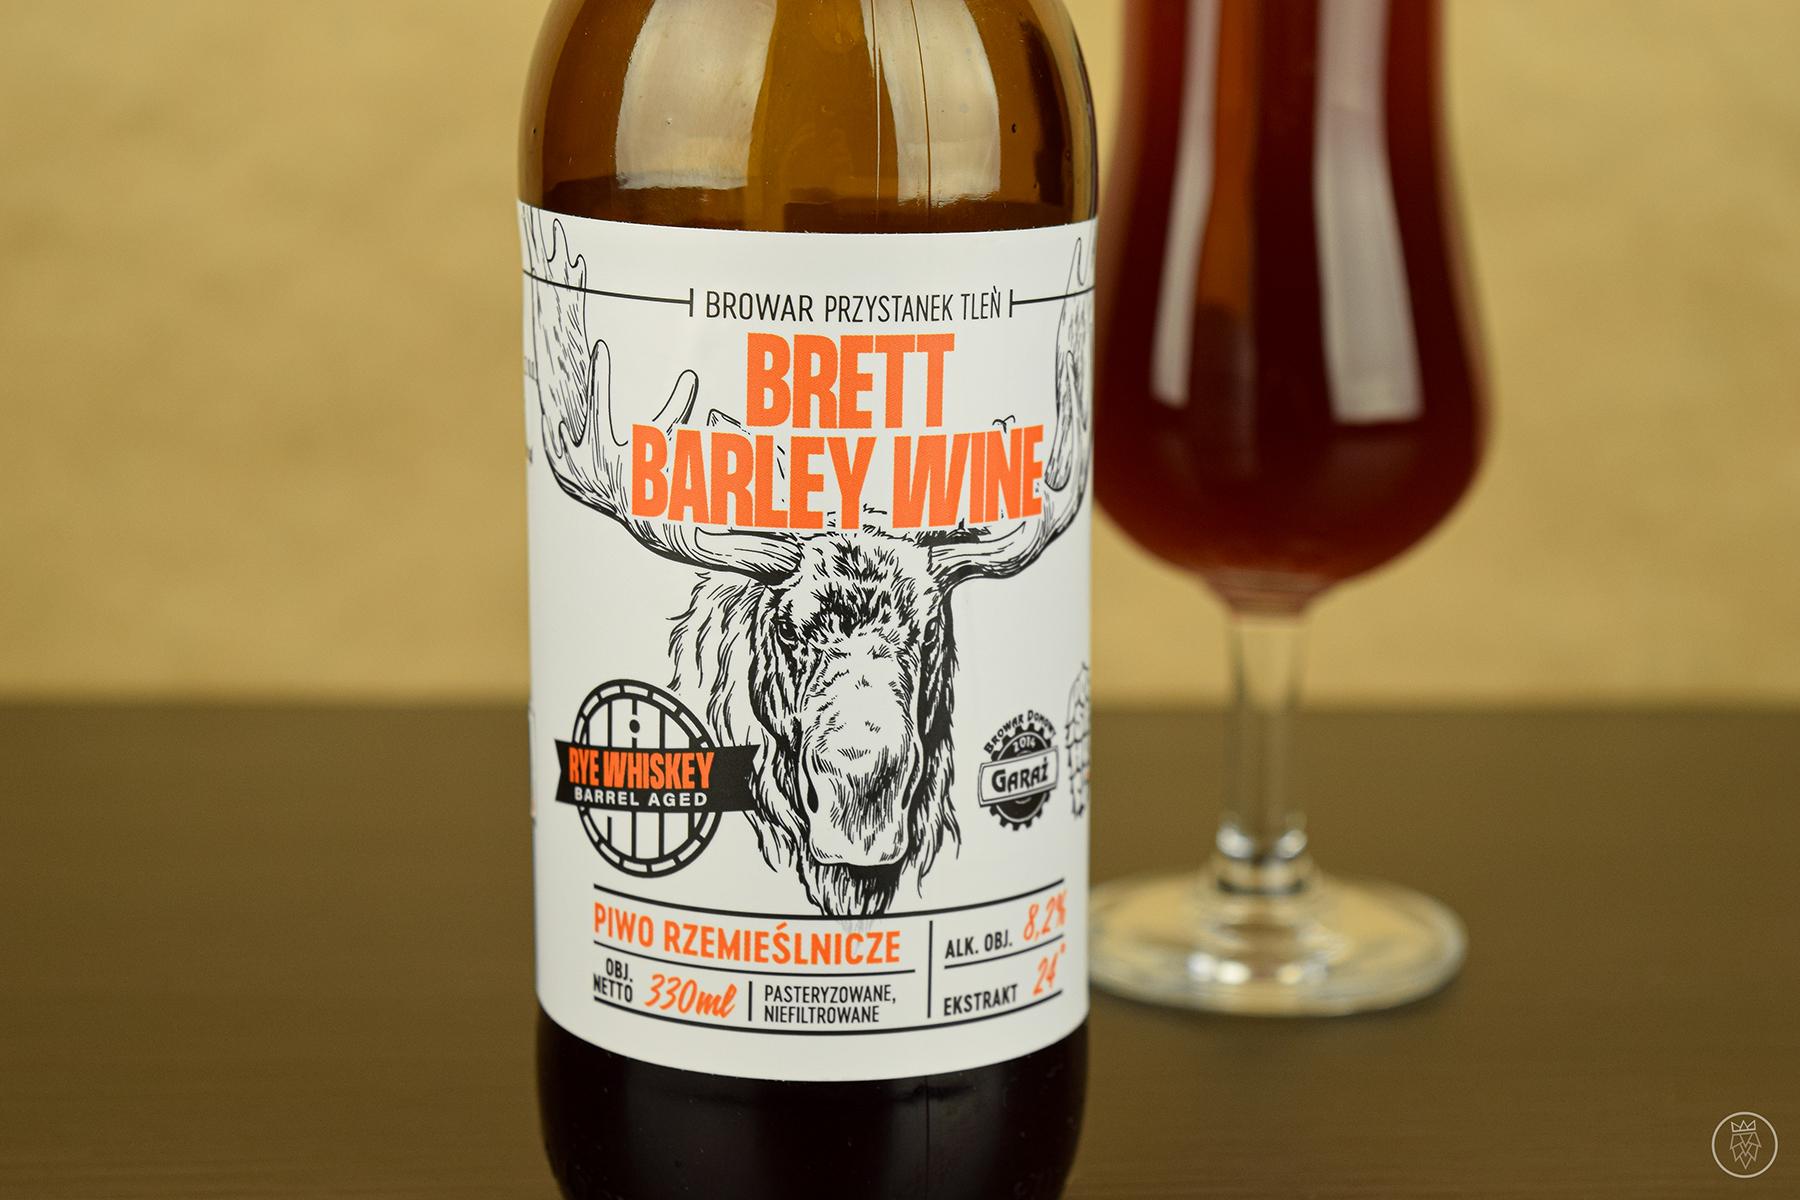 Brett Barley Wine BA 02